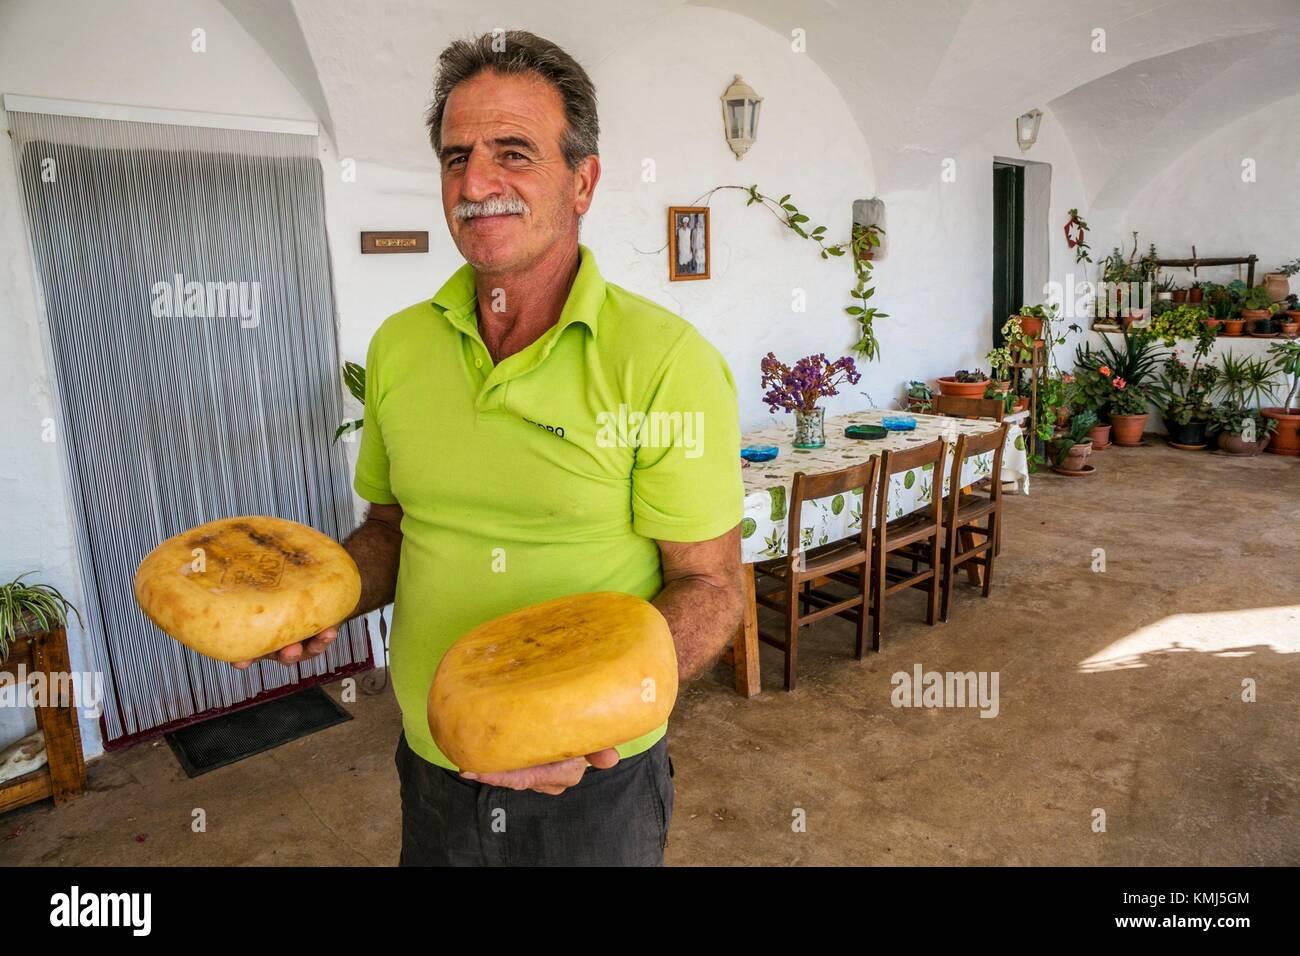 Artisan Cheese, Binicano Property, Ciutadella de Menorca Municipality. Menorca Island. Balearic Islands. Spain - Stock Image